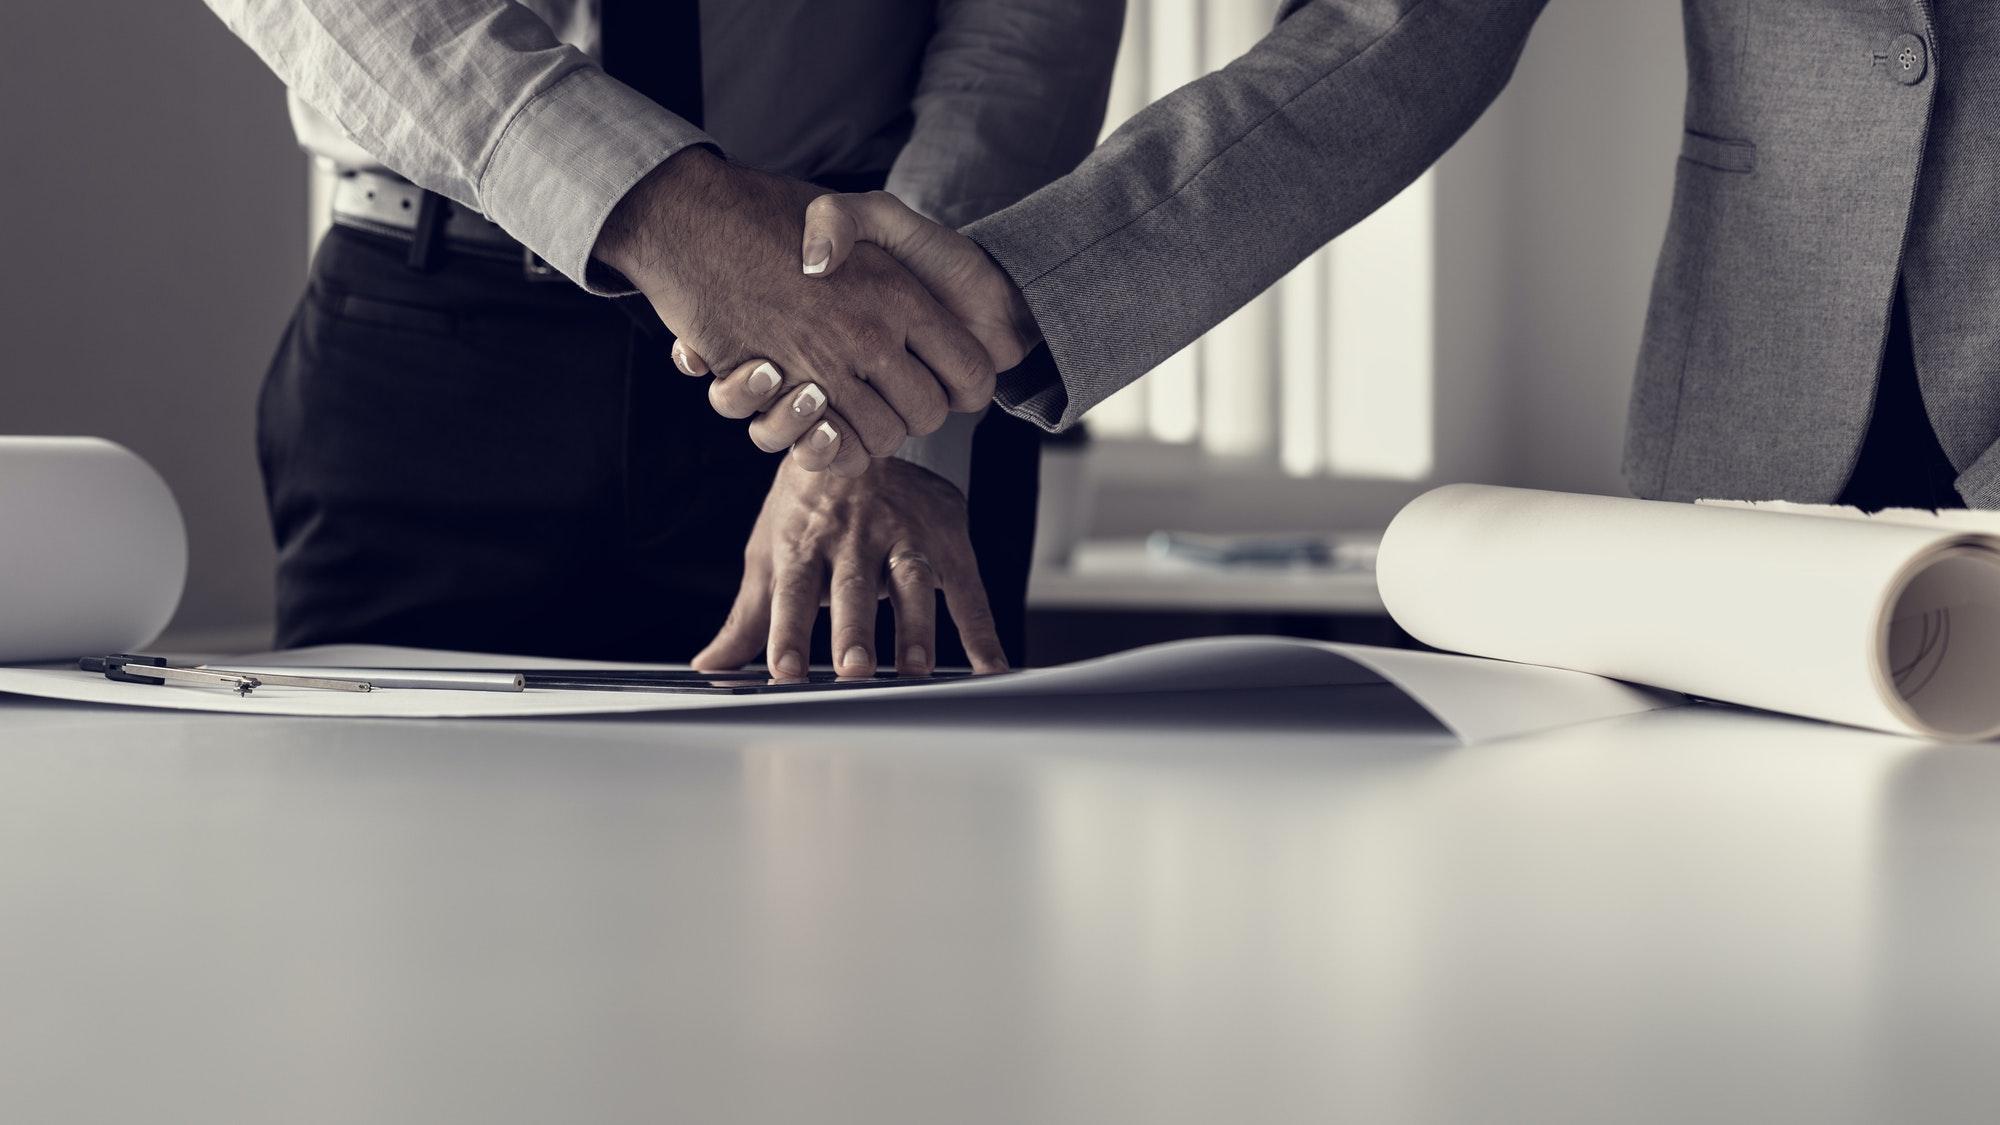 CREPP - South Atlanta Commercial Real Estate Site Selection Brokerage - Services - Property Management - 3